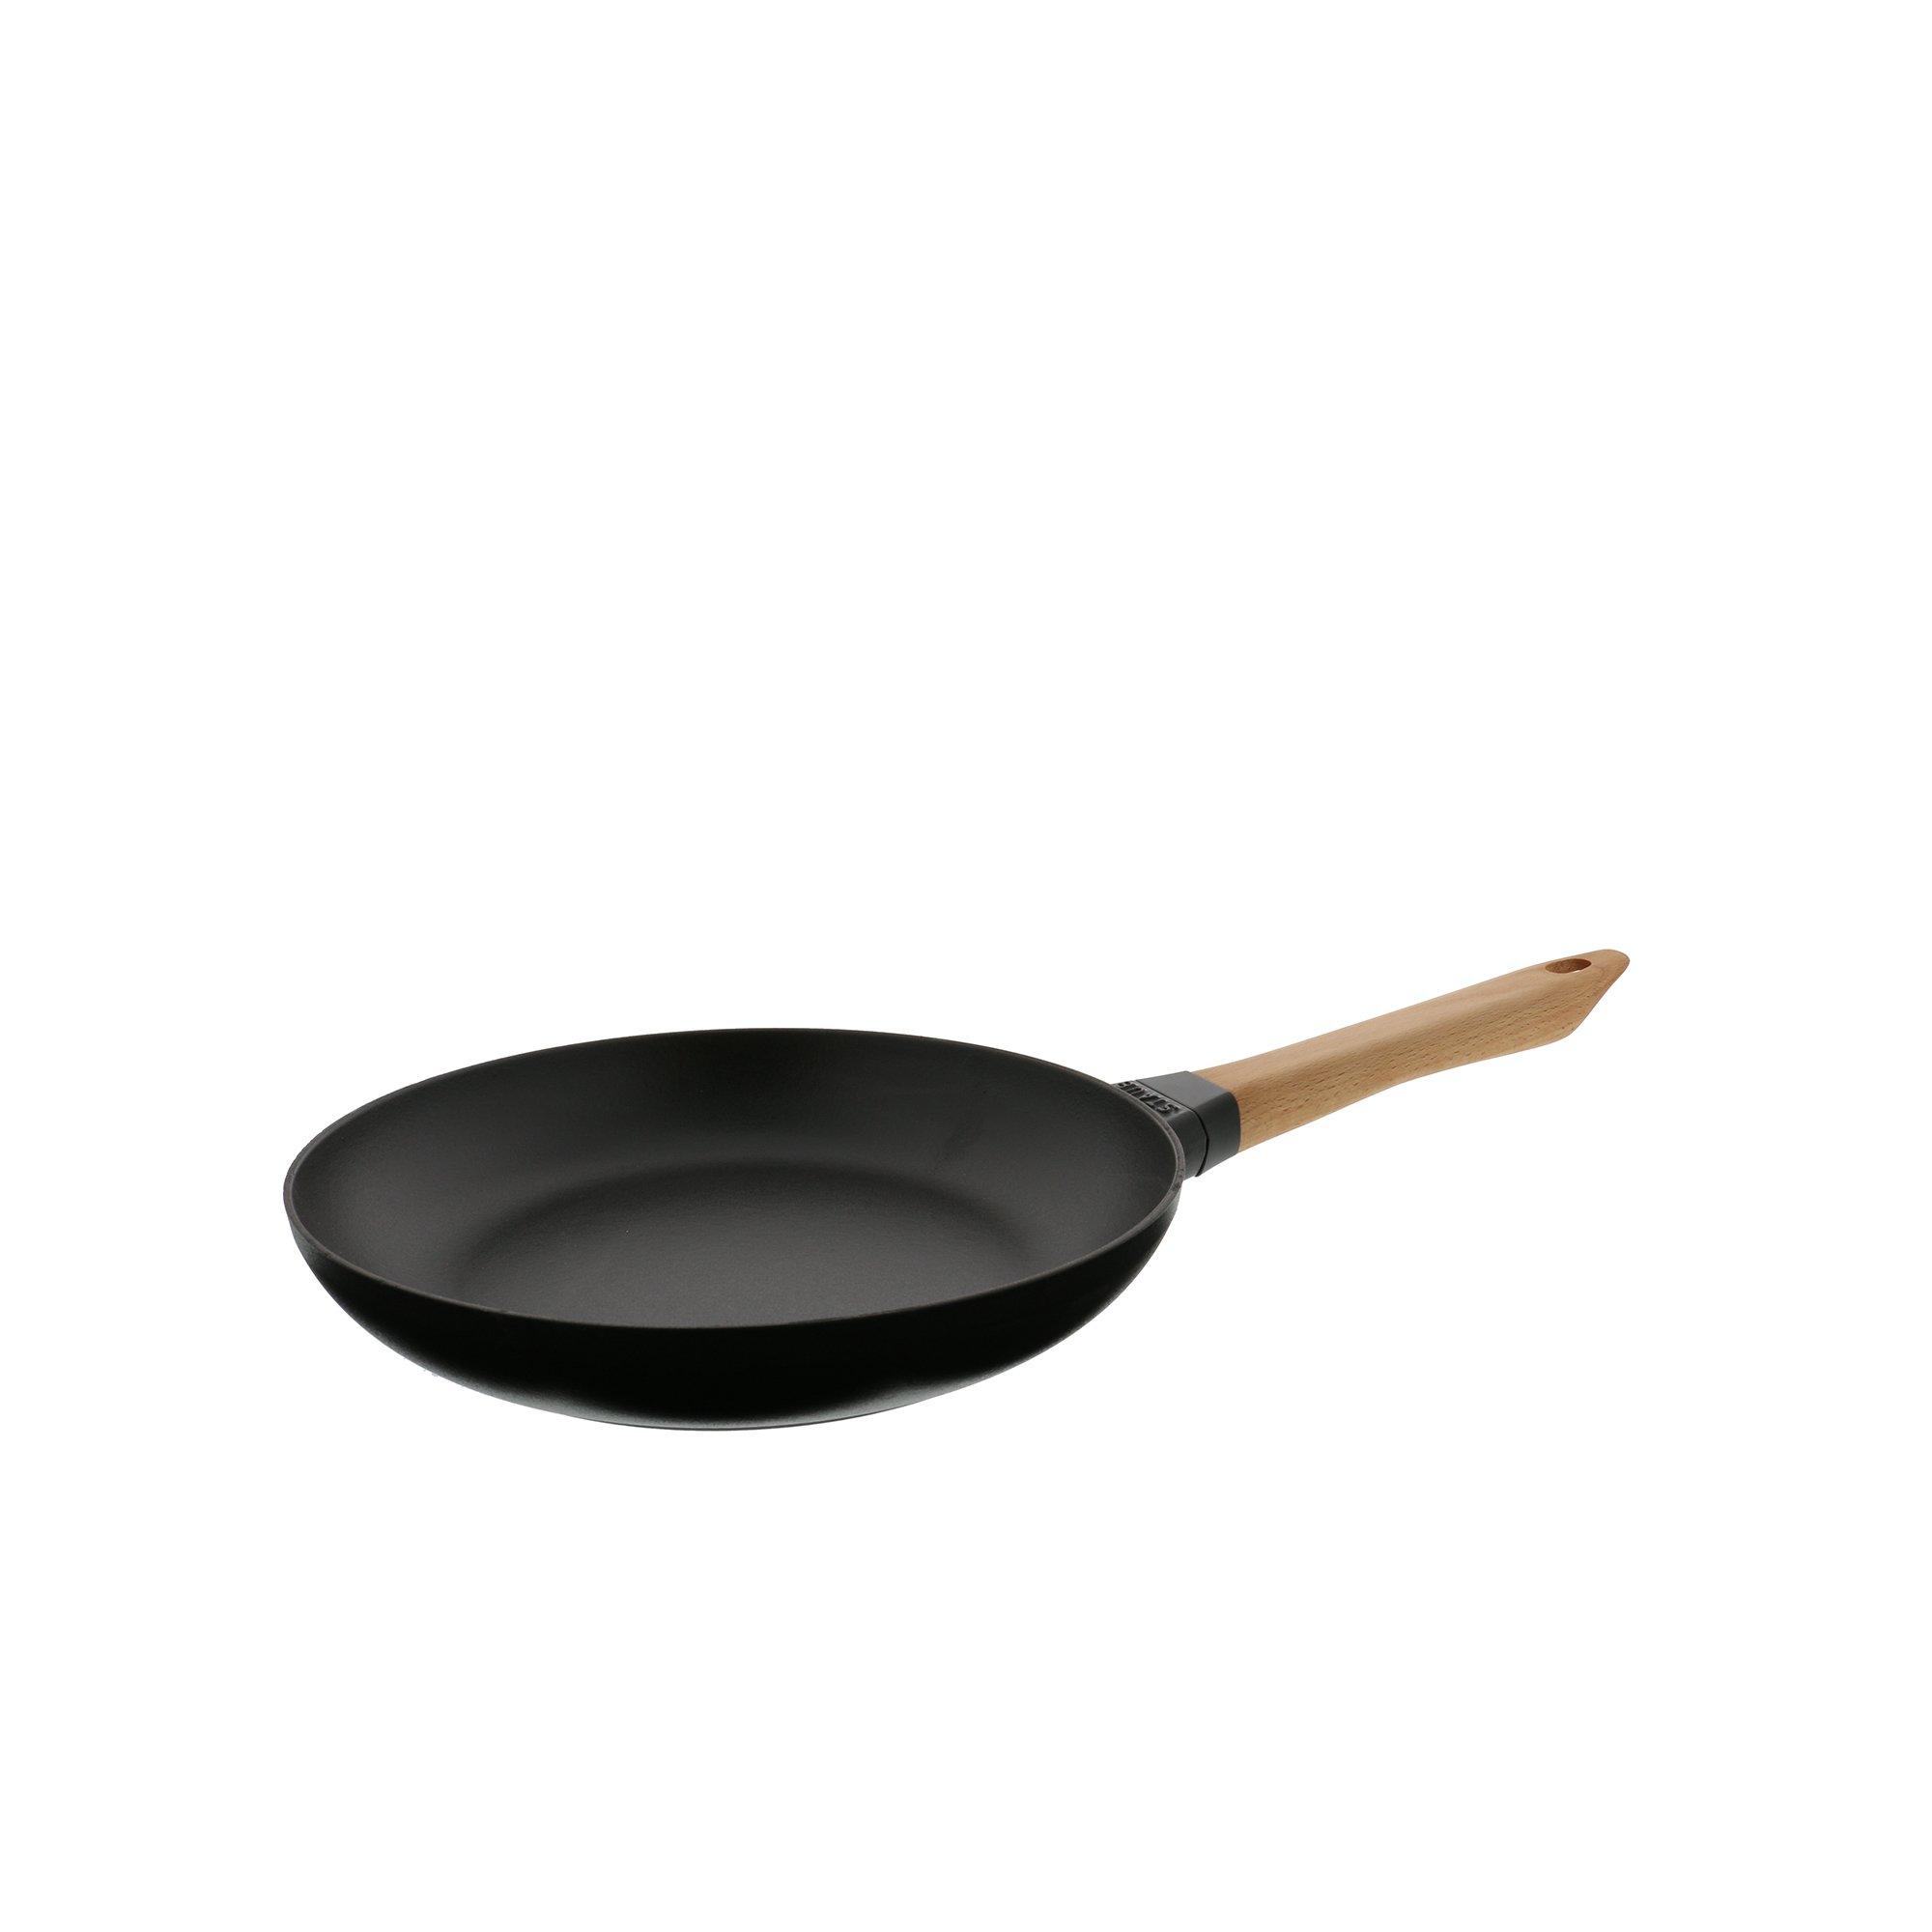 4.75-inch Black Matte Staub 1221223 Cast Iron Mini Frying Pan